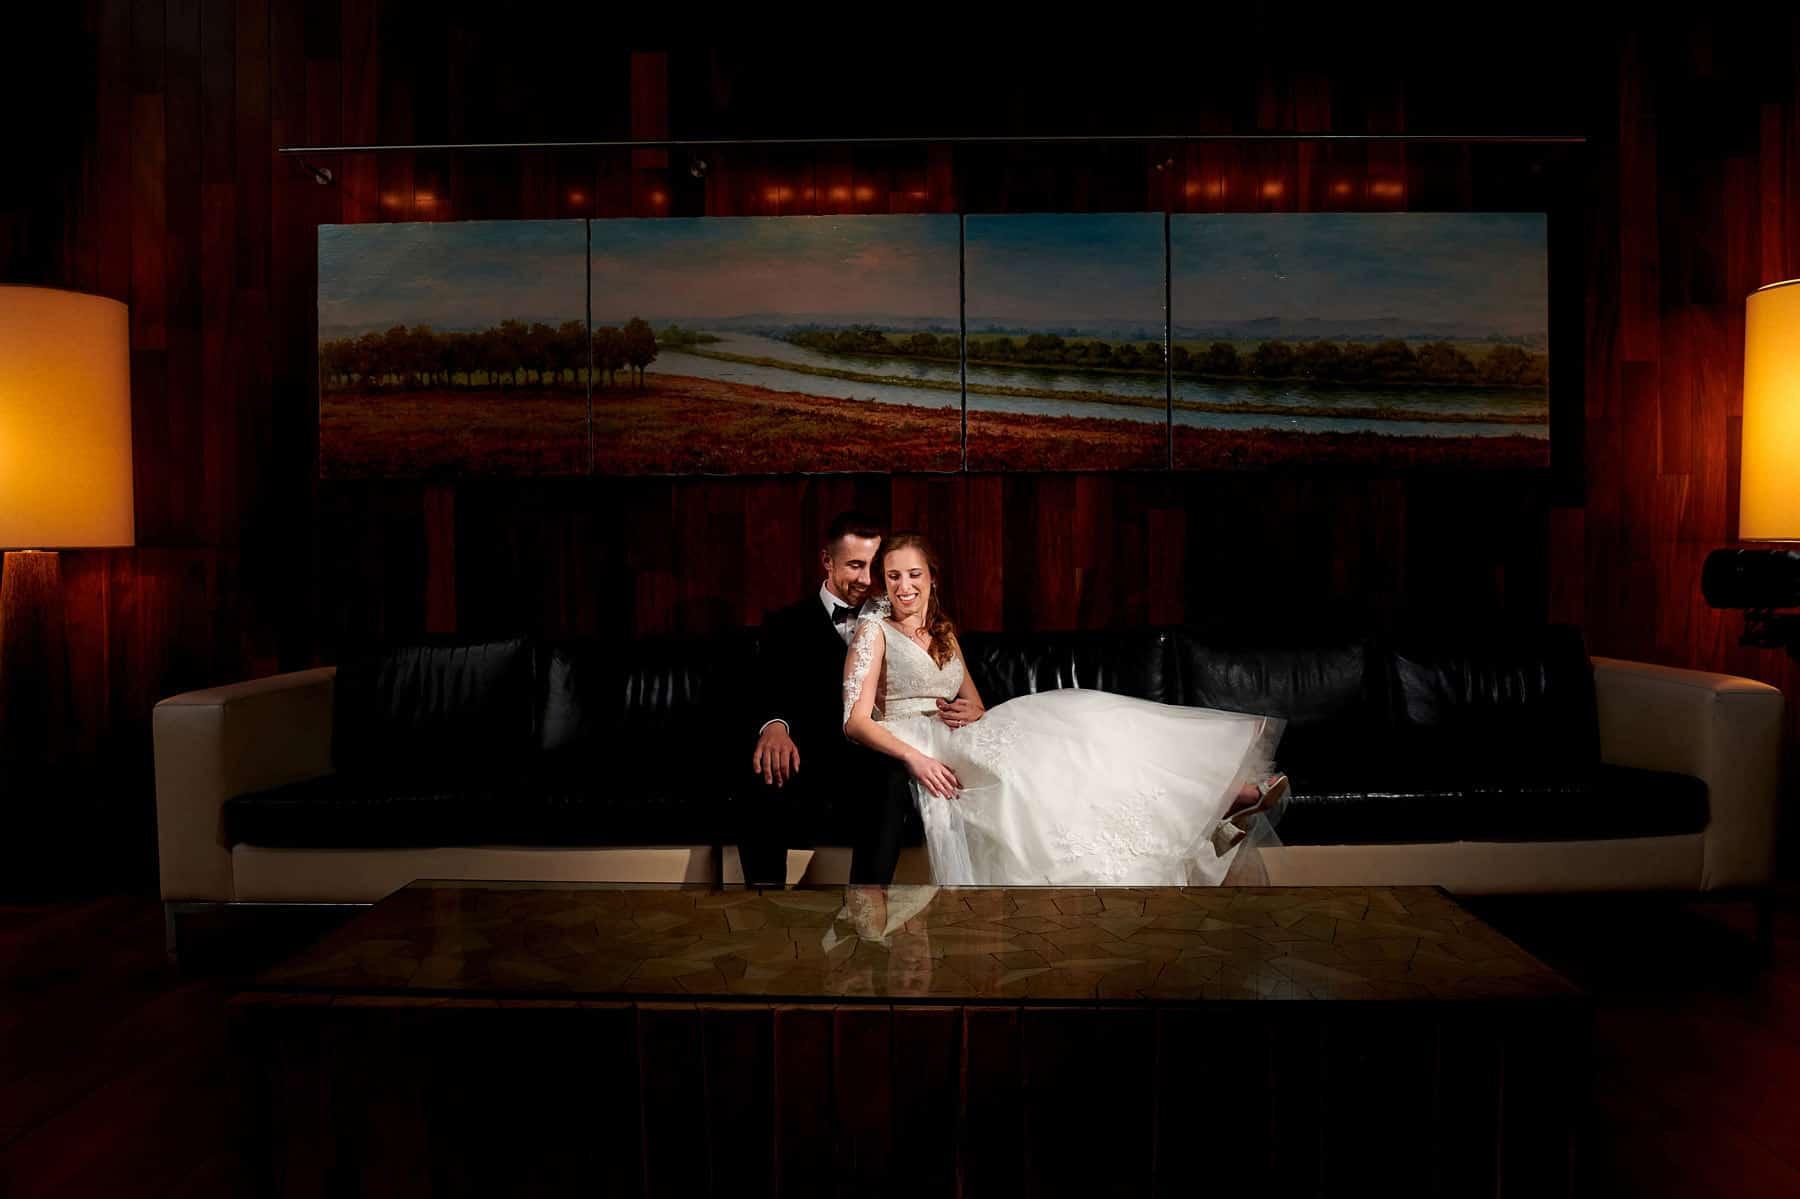 wedding photo at hyatt new brunswick